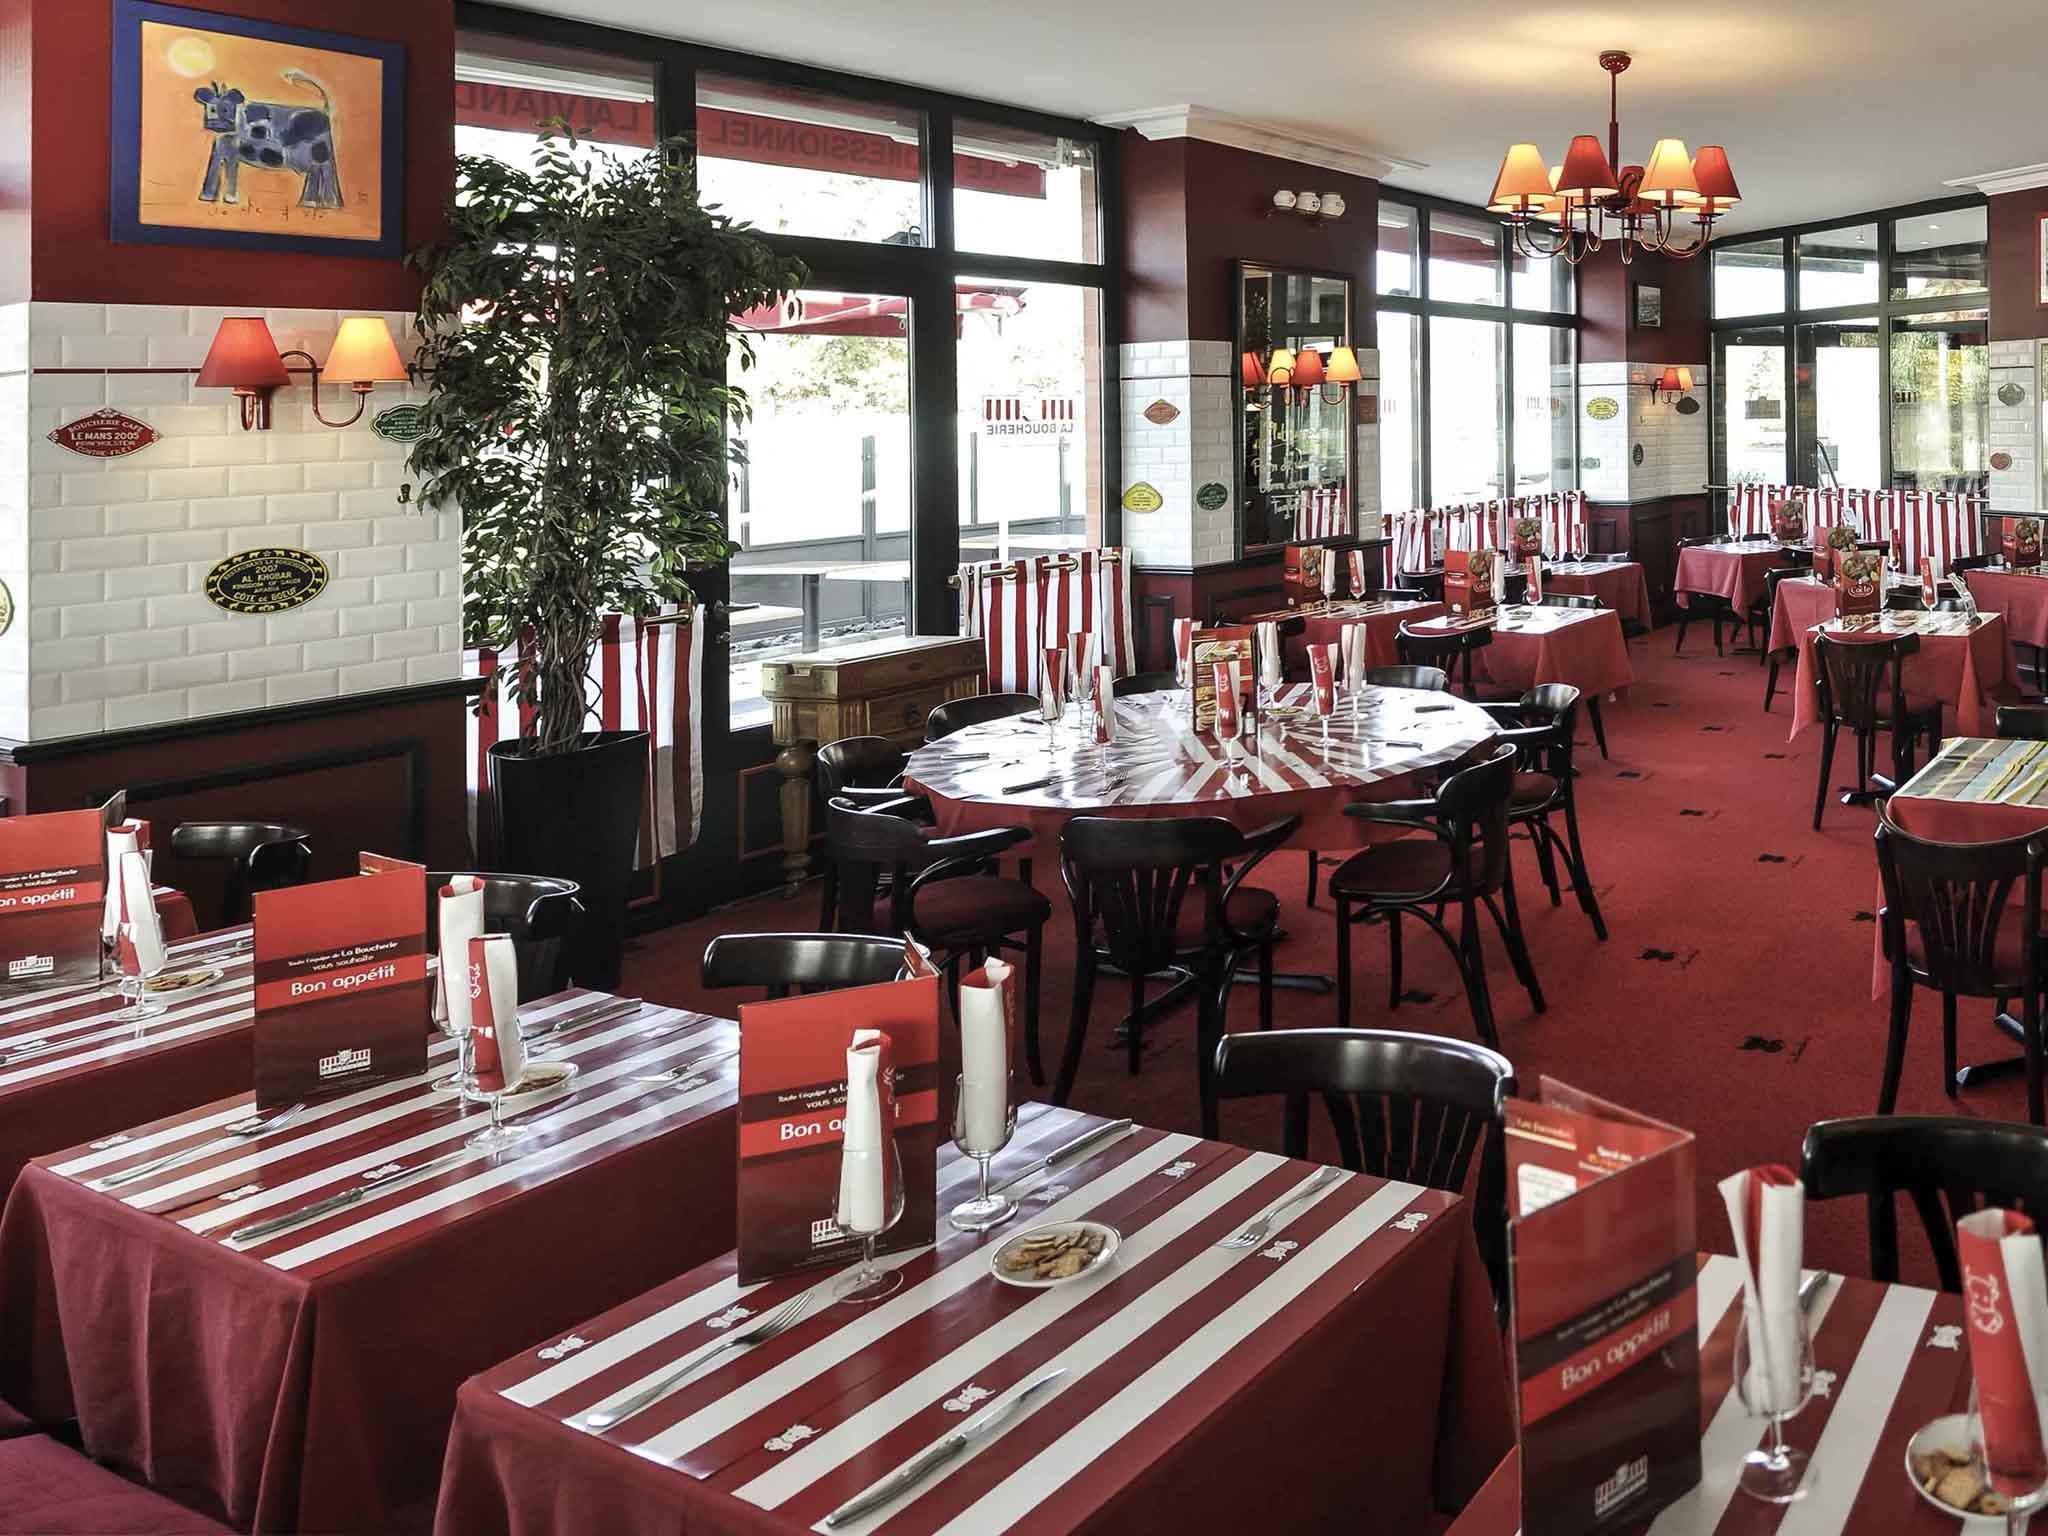 Hotel in haguenau ibis haguenau strasbourg nord for Restaurant haguenau